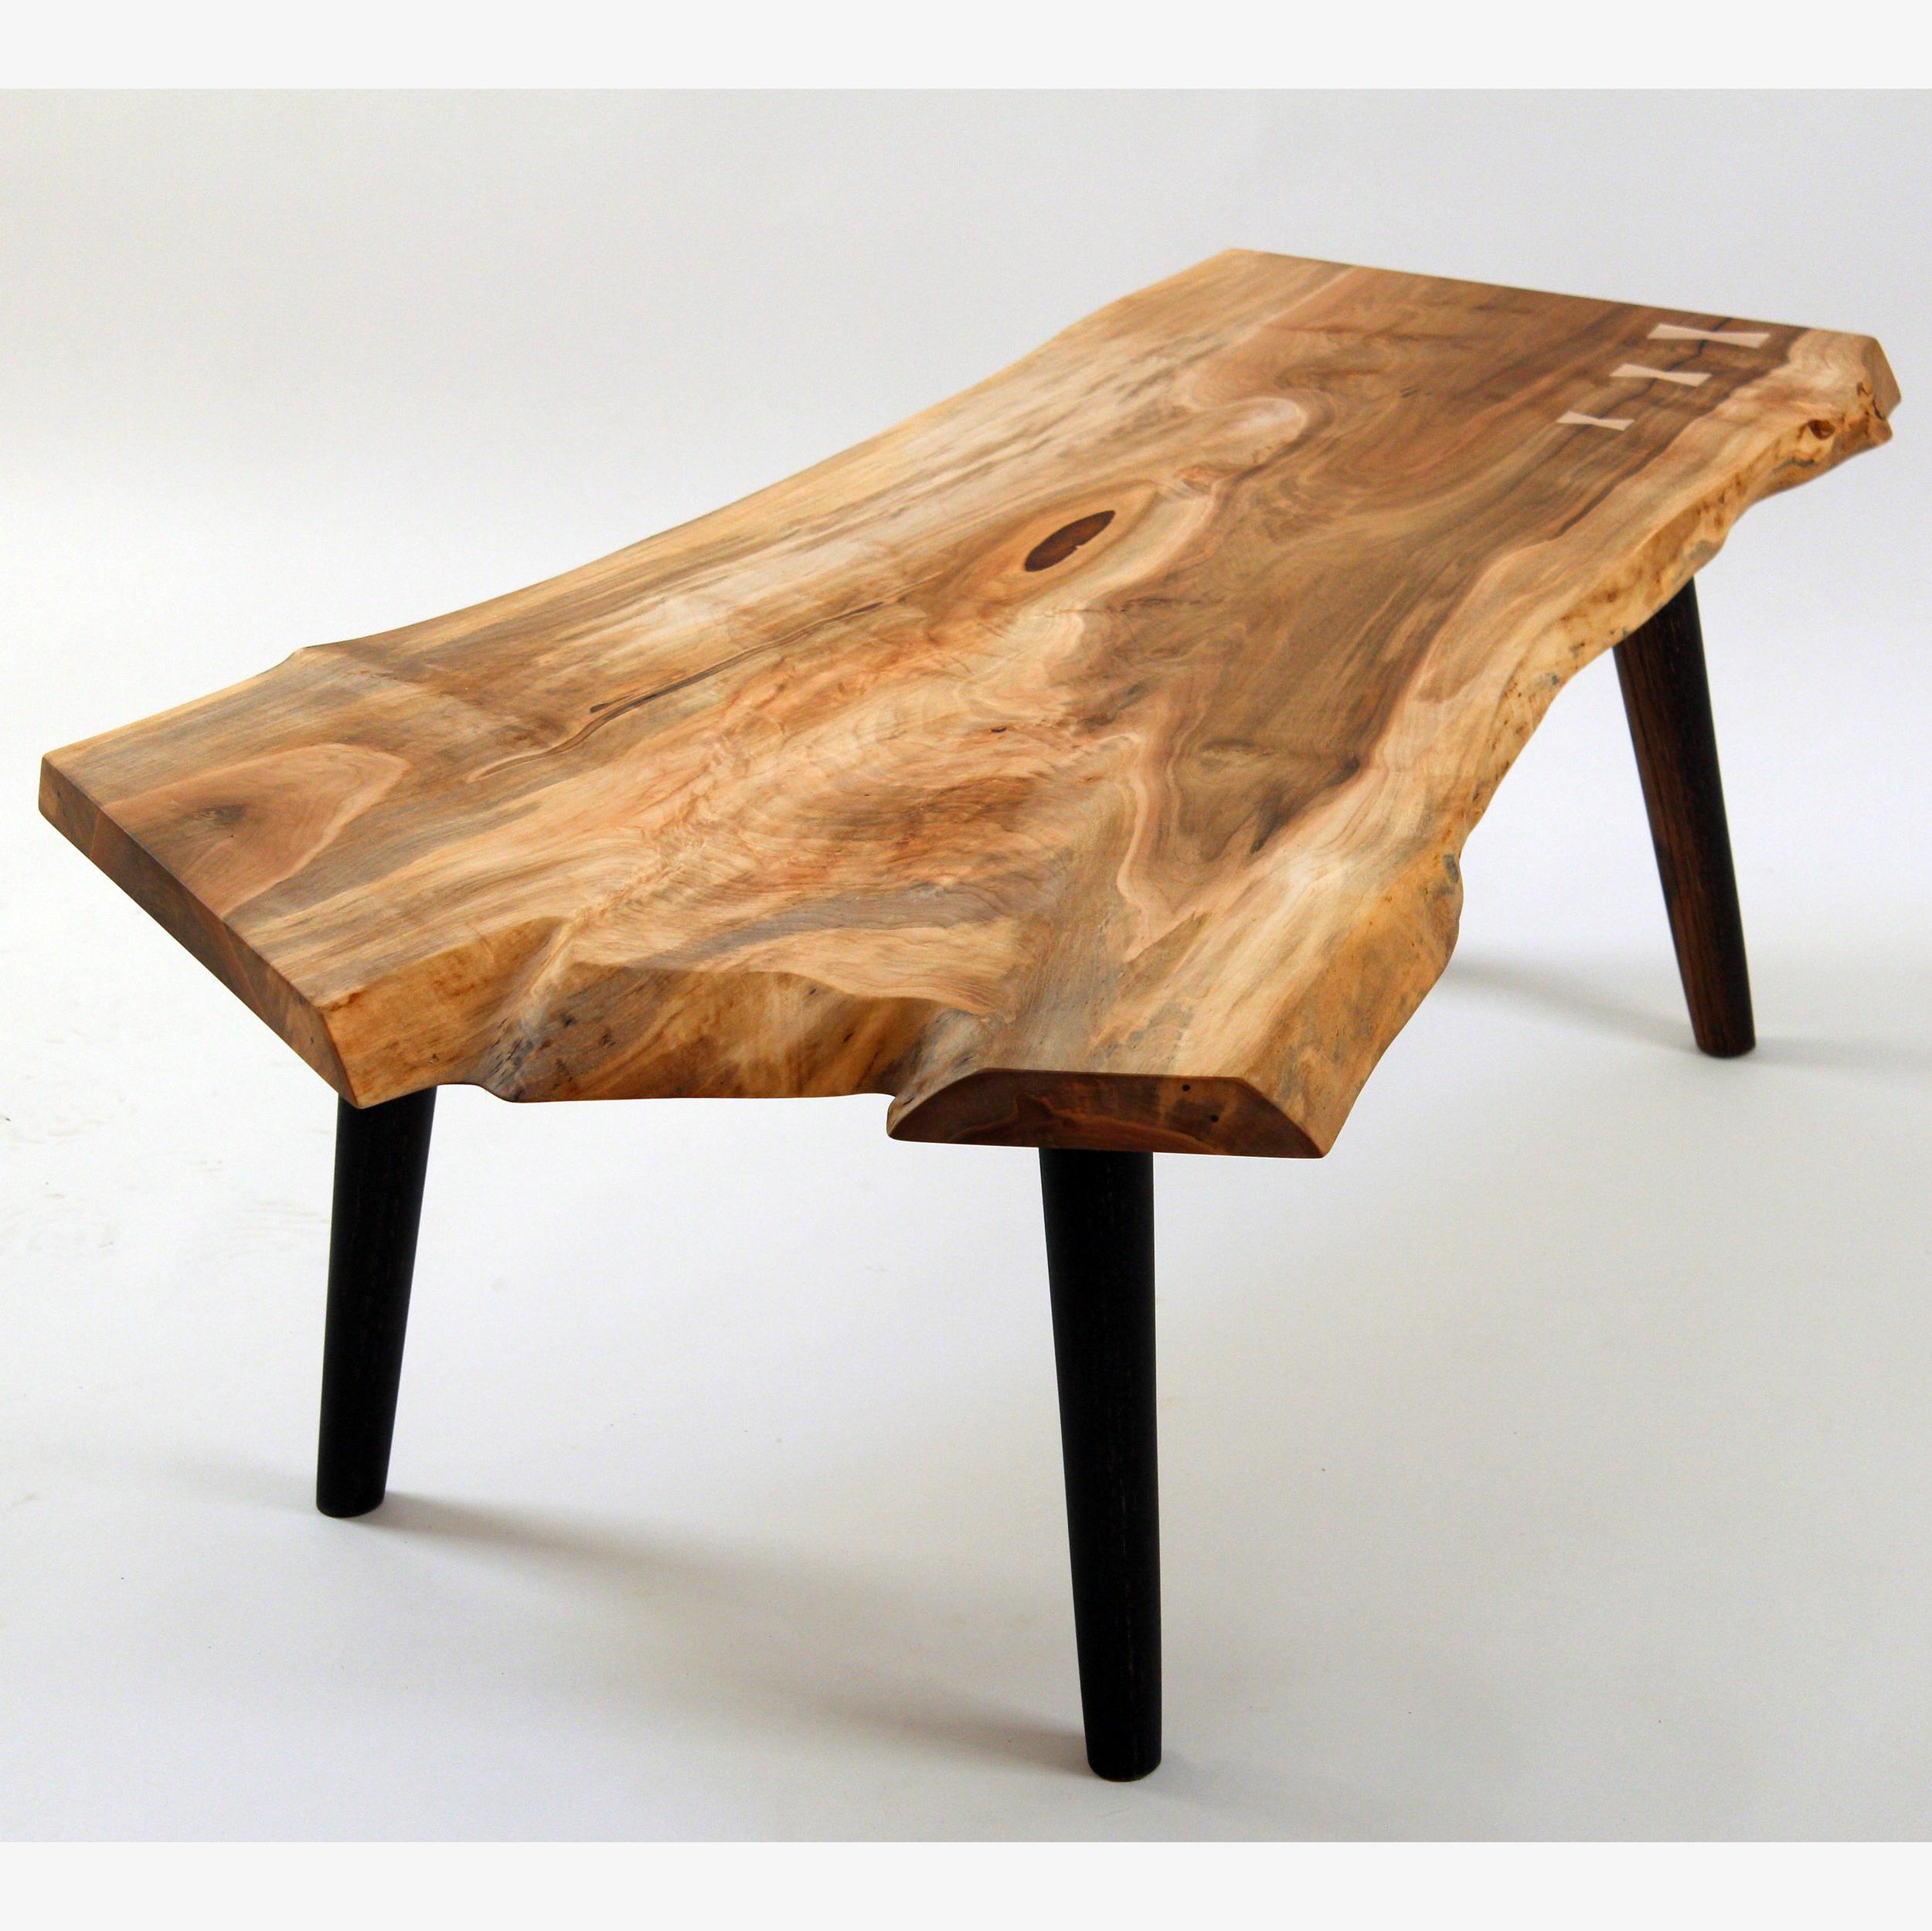 wheelhouse table 2.png